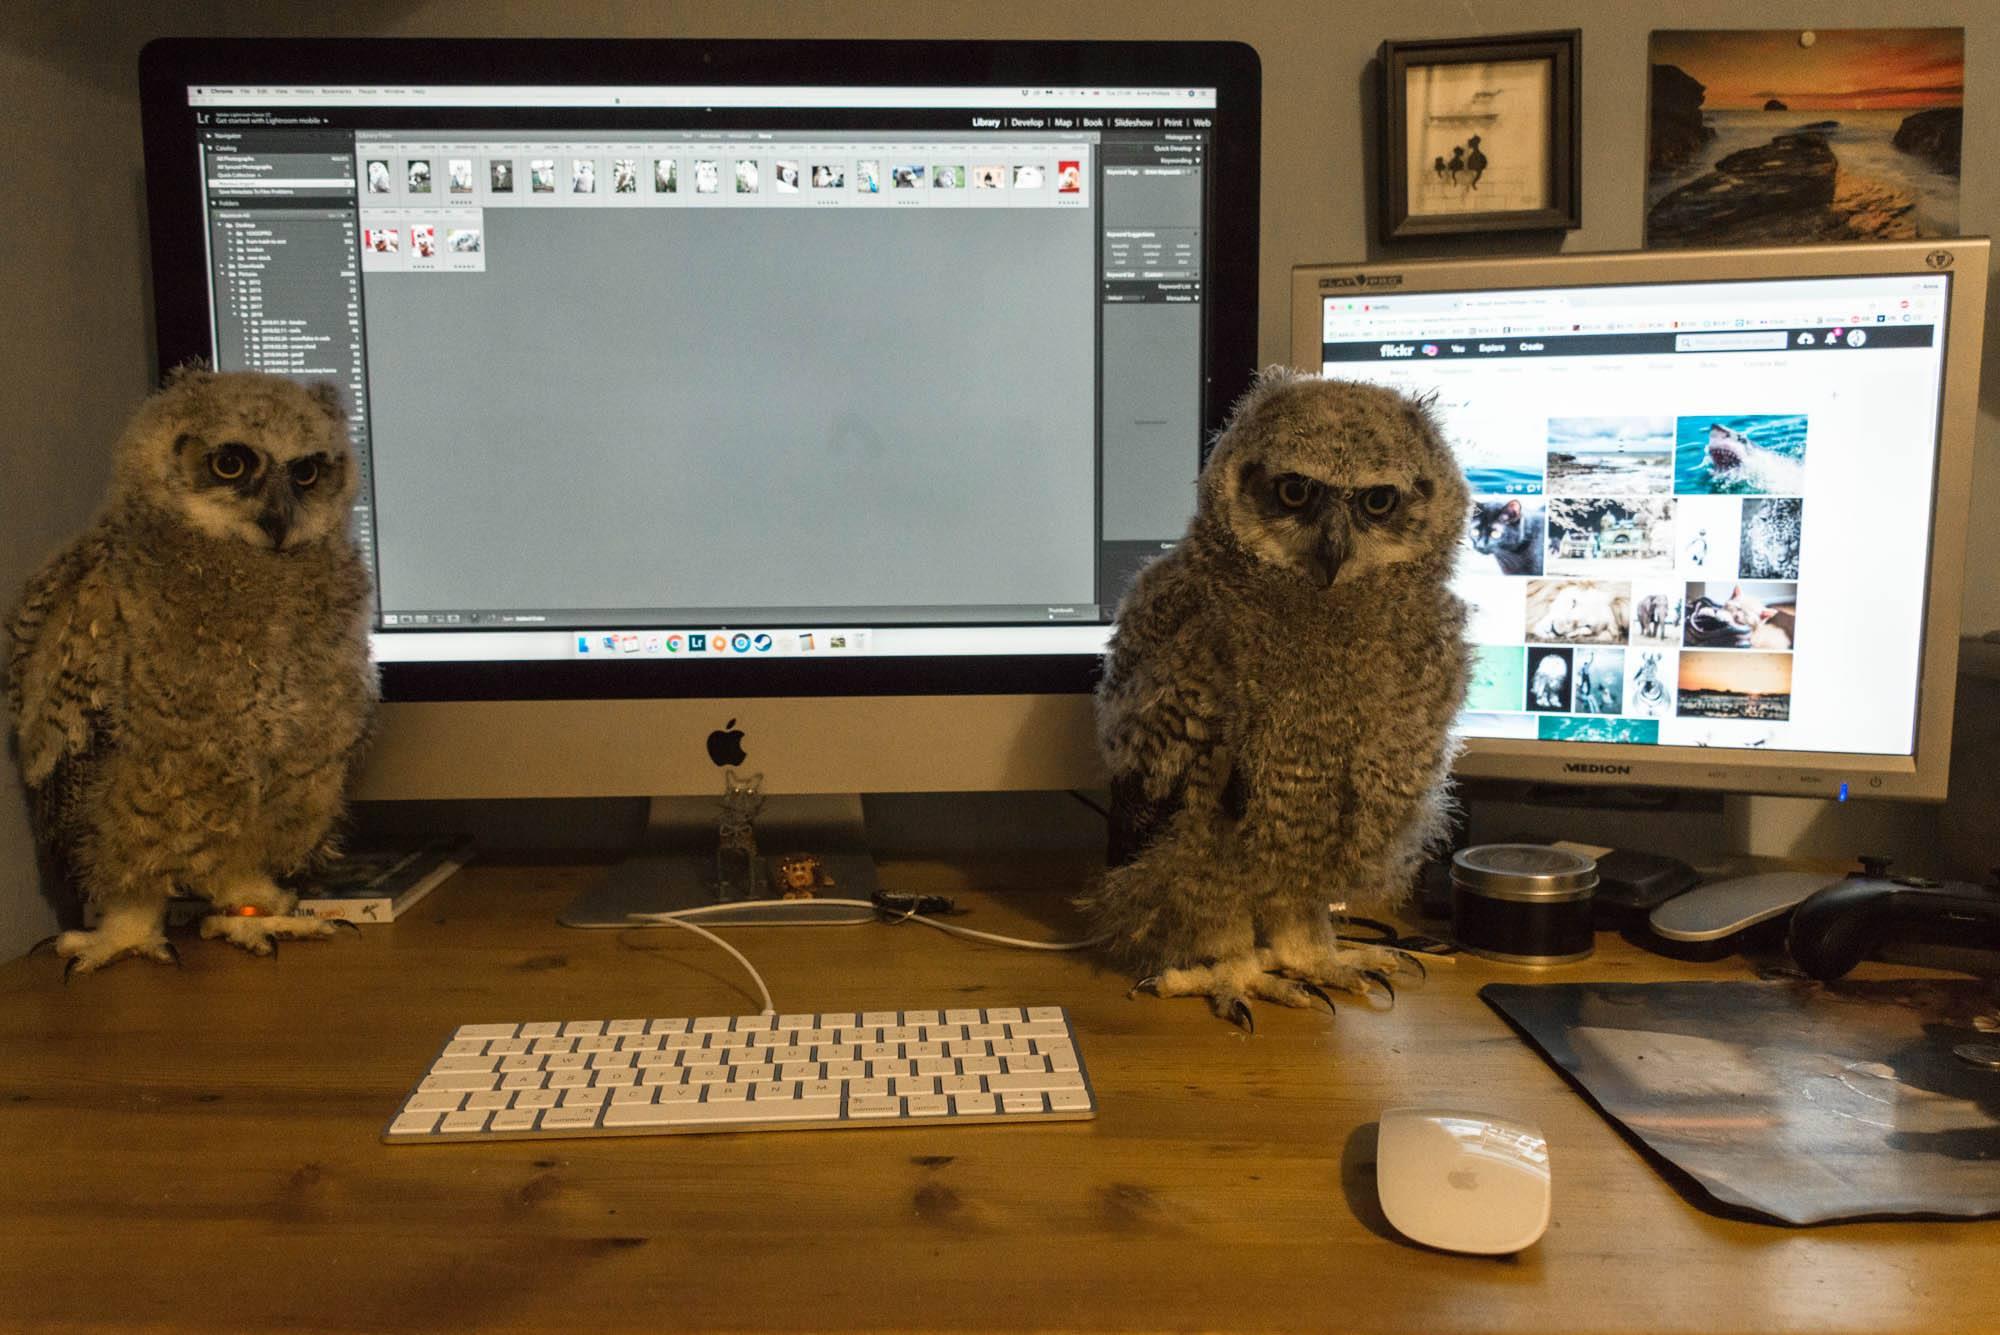 Baby great horned owls vs Imac